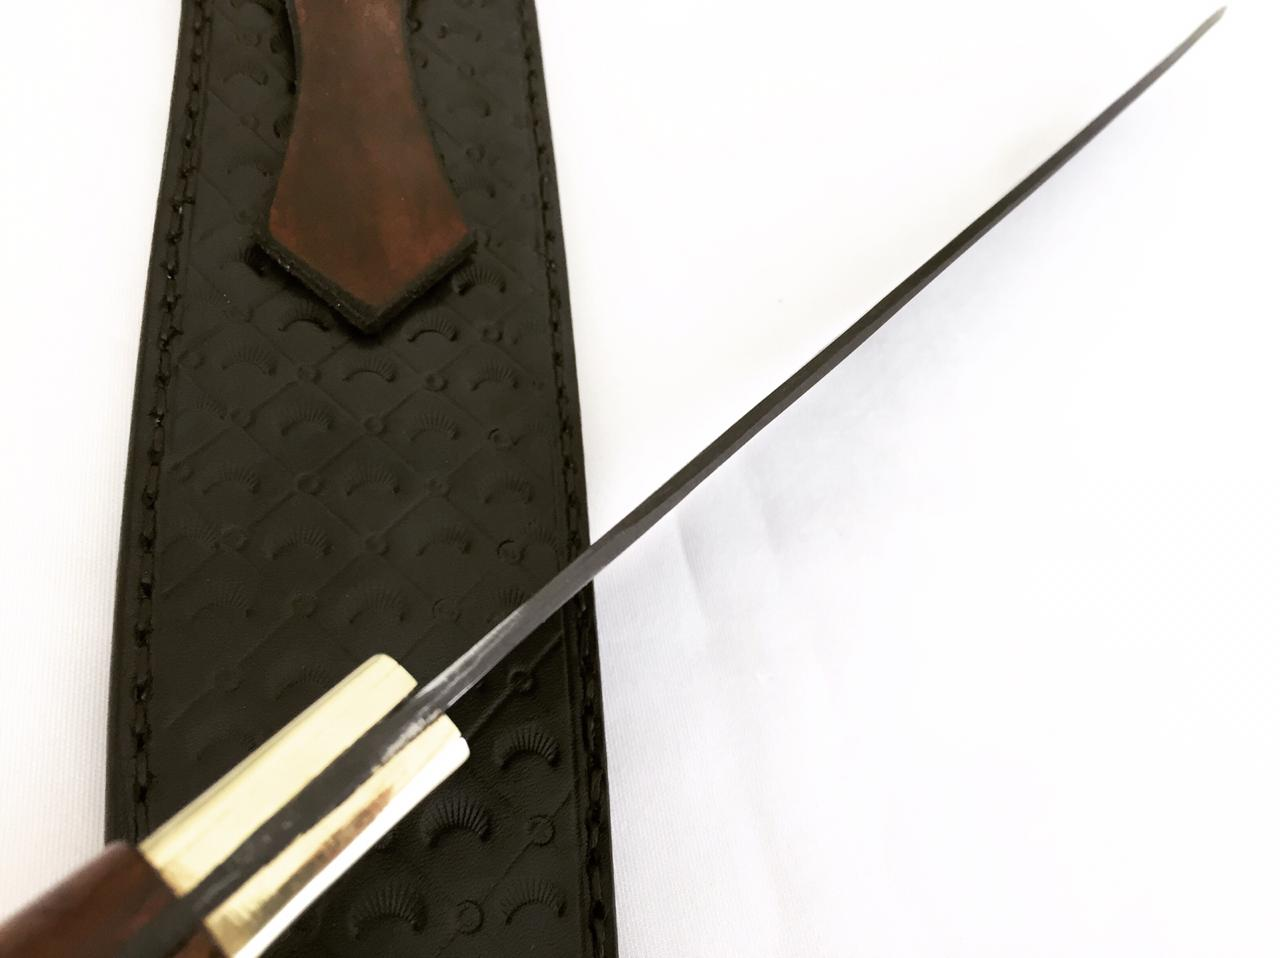 Faca artesanal negra disco de arado tatu marchesan 12 polegadas